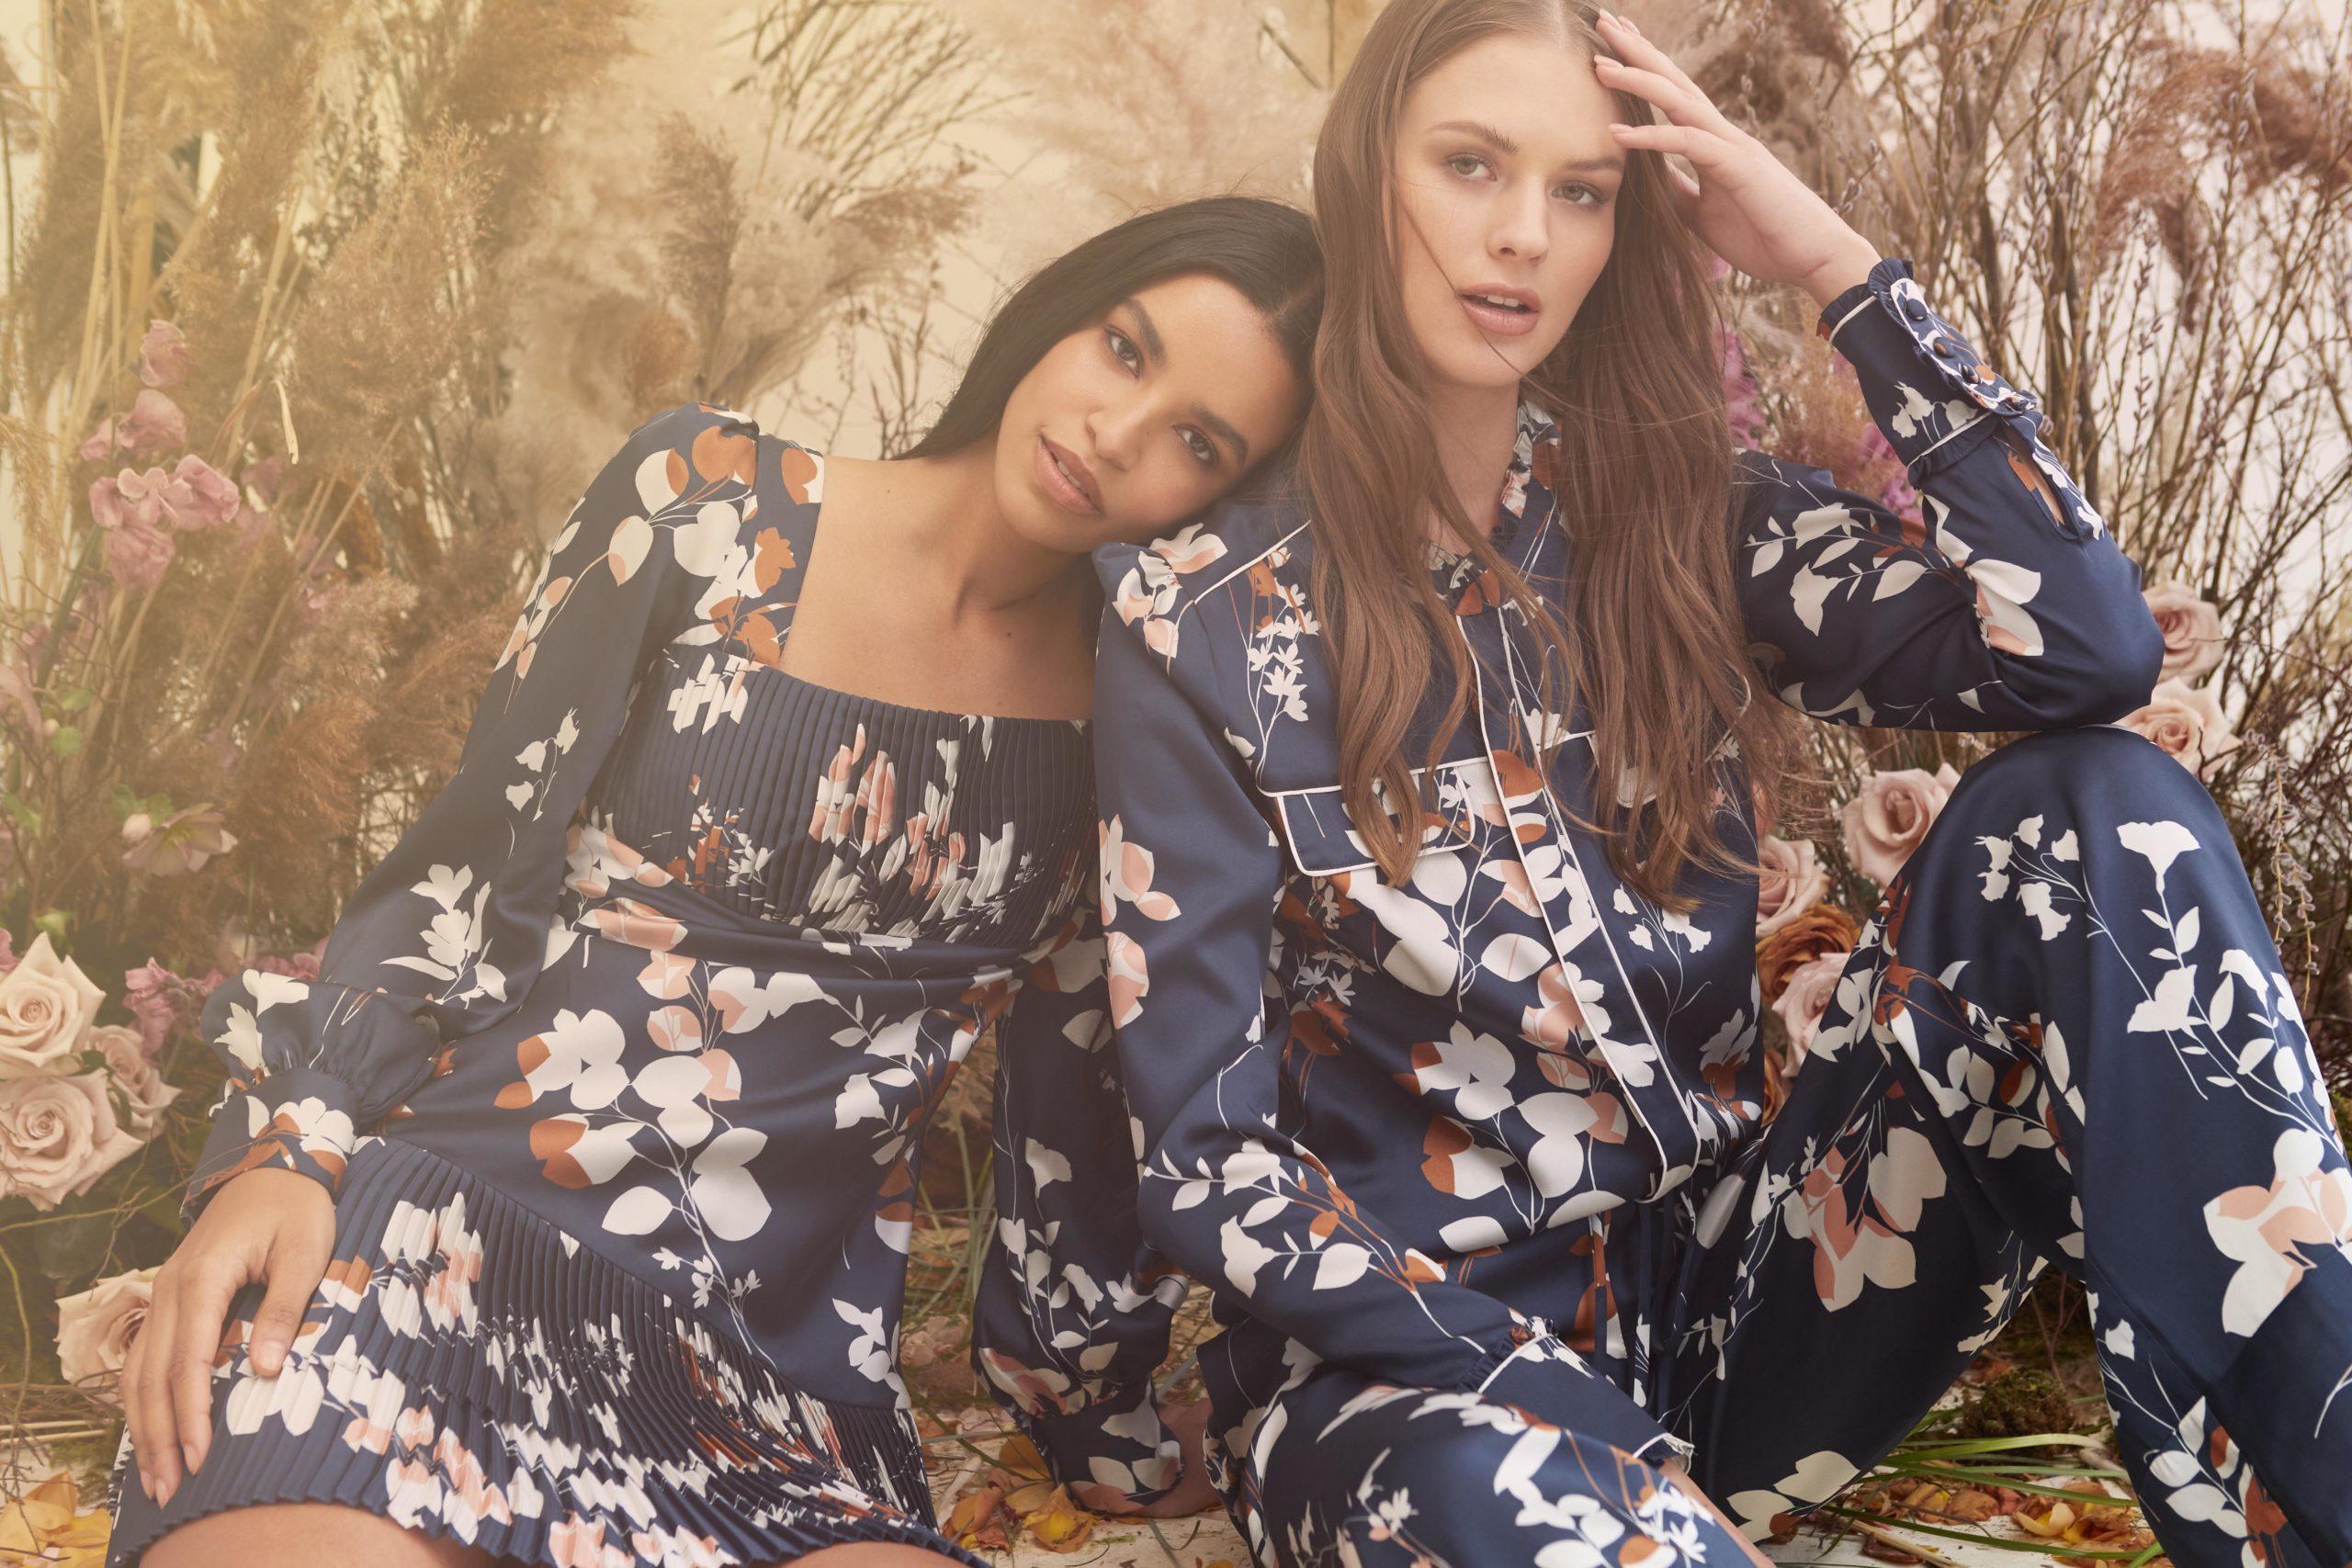 Advertising Photography for Fashion Brand Monique Lhuillier with Models Austria Ulloa and Alena Frolova I Greg Sorensen I Fashion & Beauty Photographer I NYC